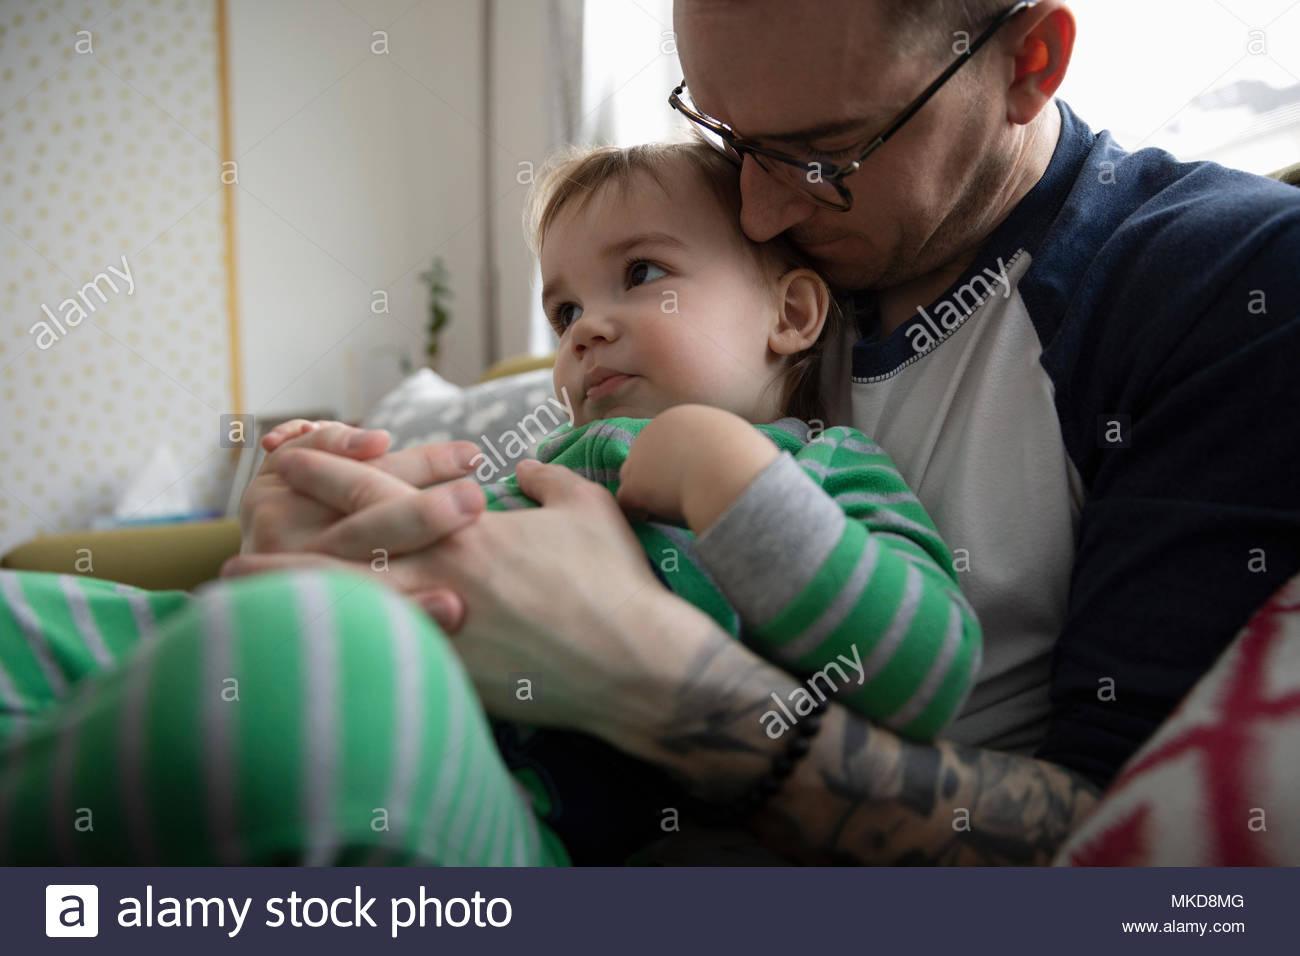 Afectuoso padre tierno abrazo hijo Imagen De Stock